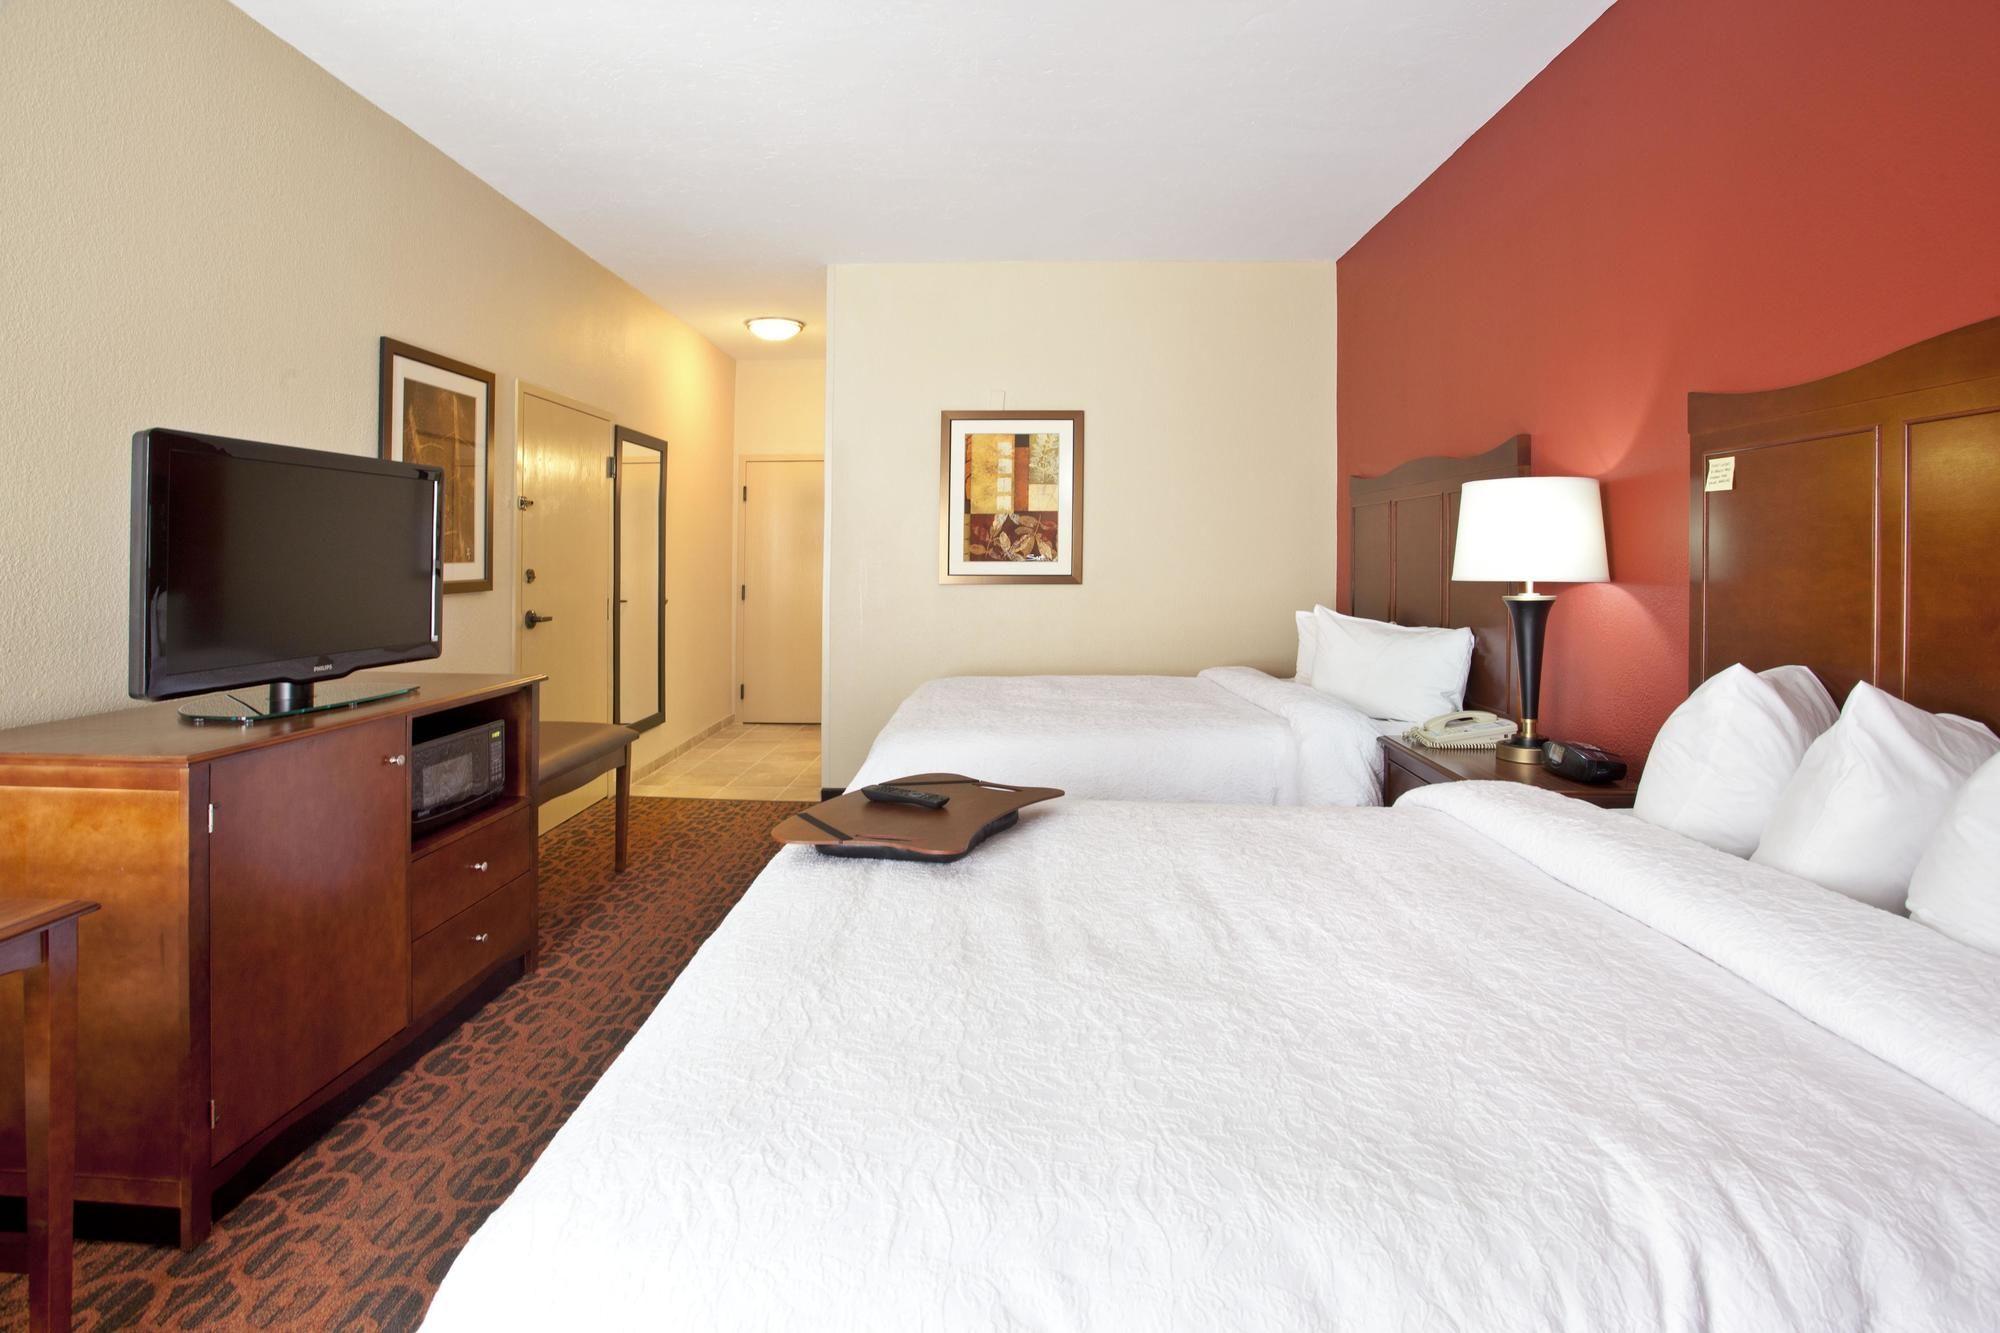 Discount Coupon for Hampton Inn & Suites El Paso-Airport ...